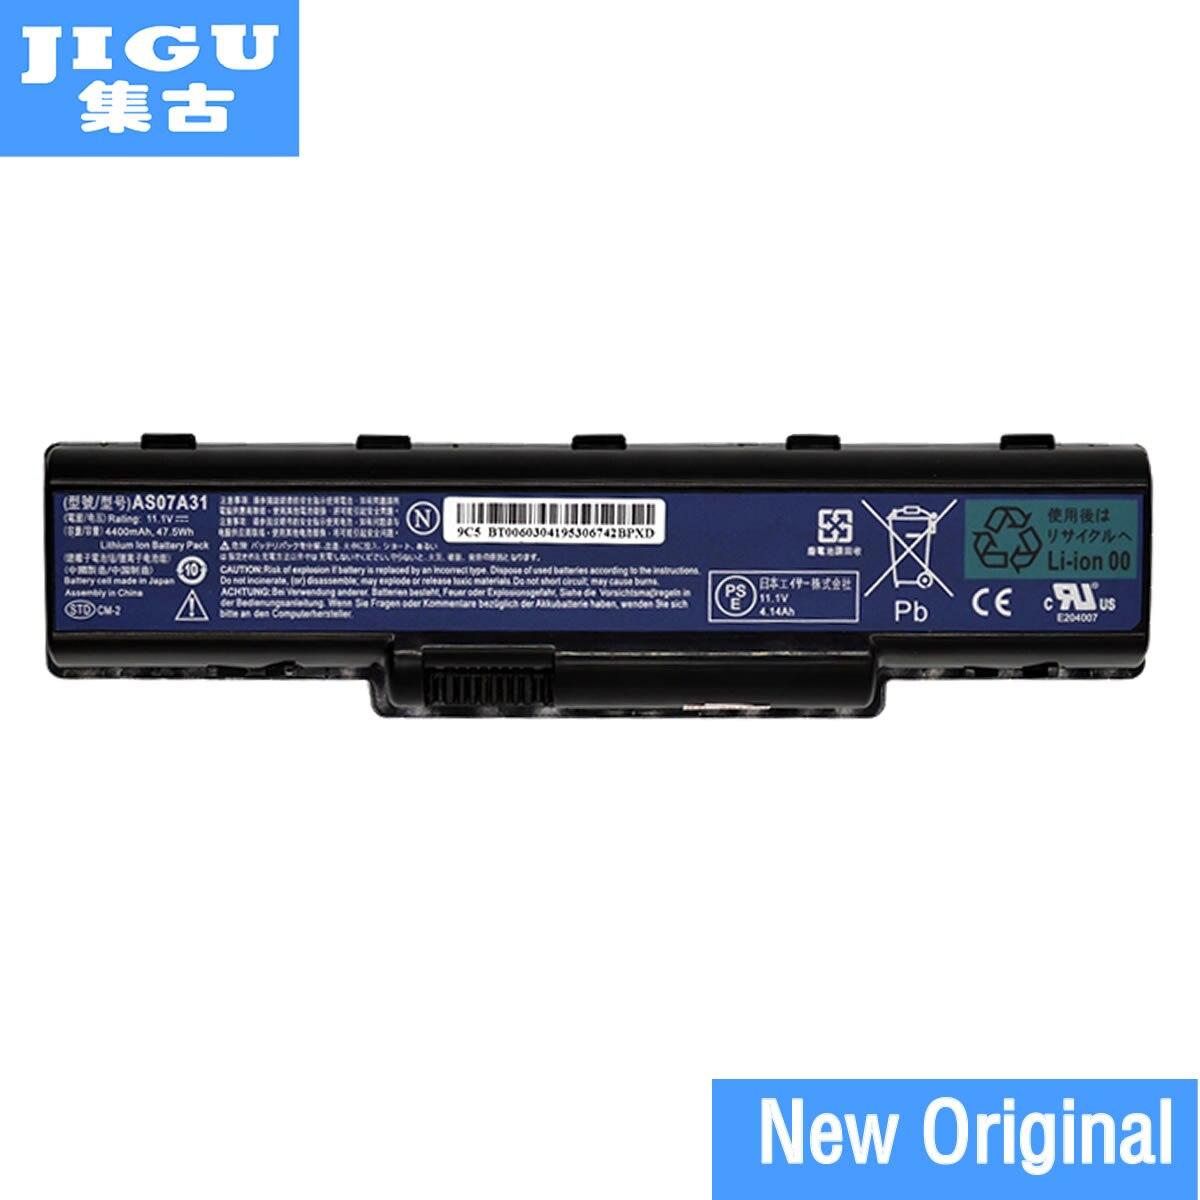 JIGU AS07A31 AS07A32 AS07A41 AS07A42 AS07A51 AS07A52 AS07A71 AS07A72 As07a75 Original Laptop Battery For ACER